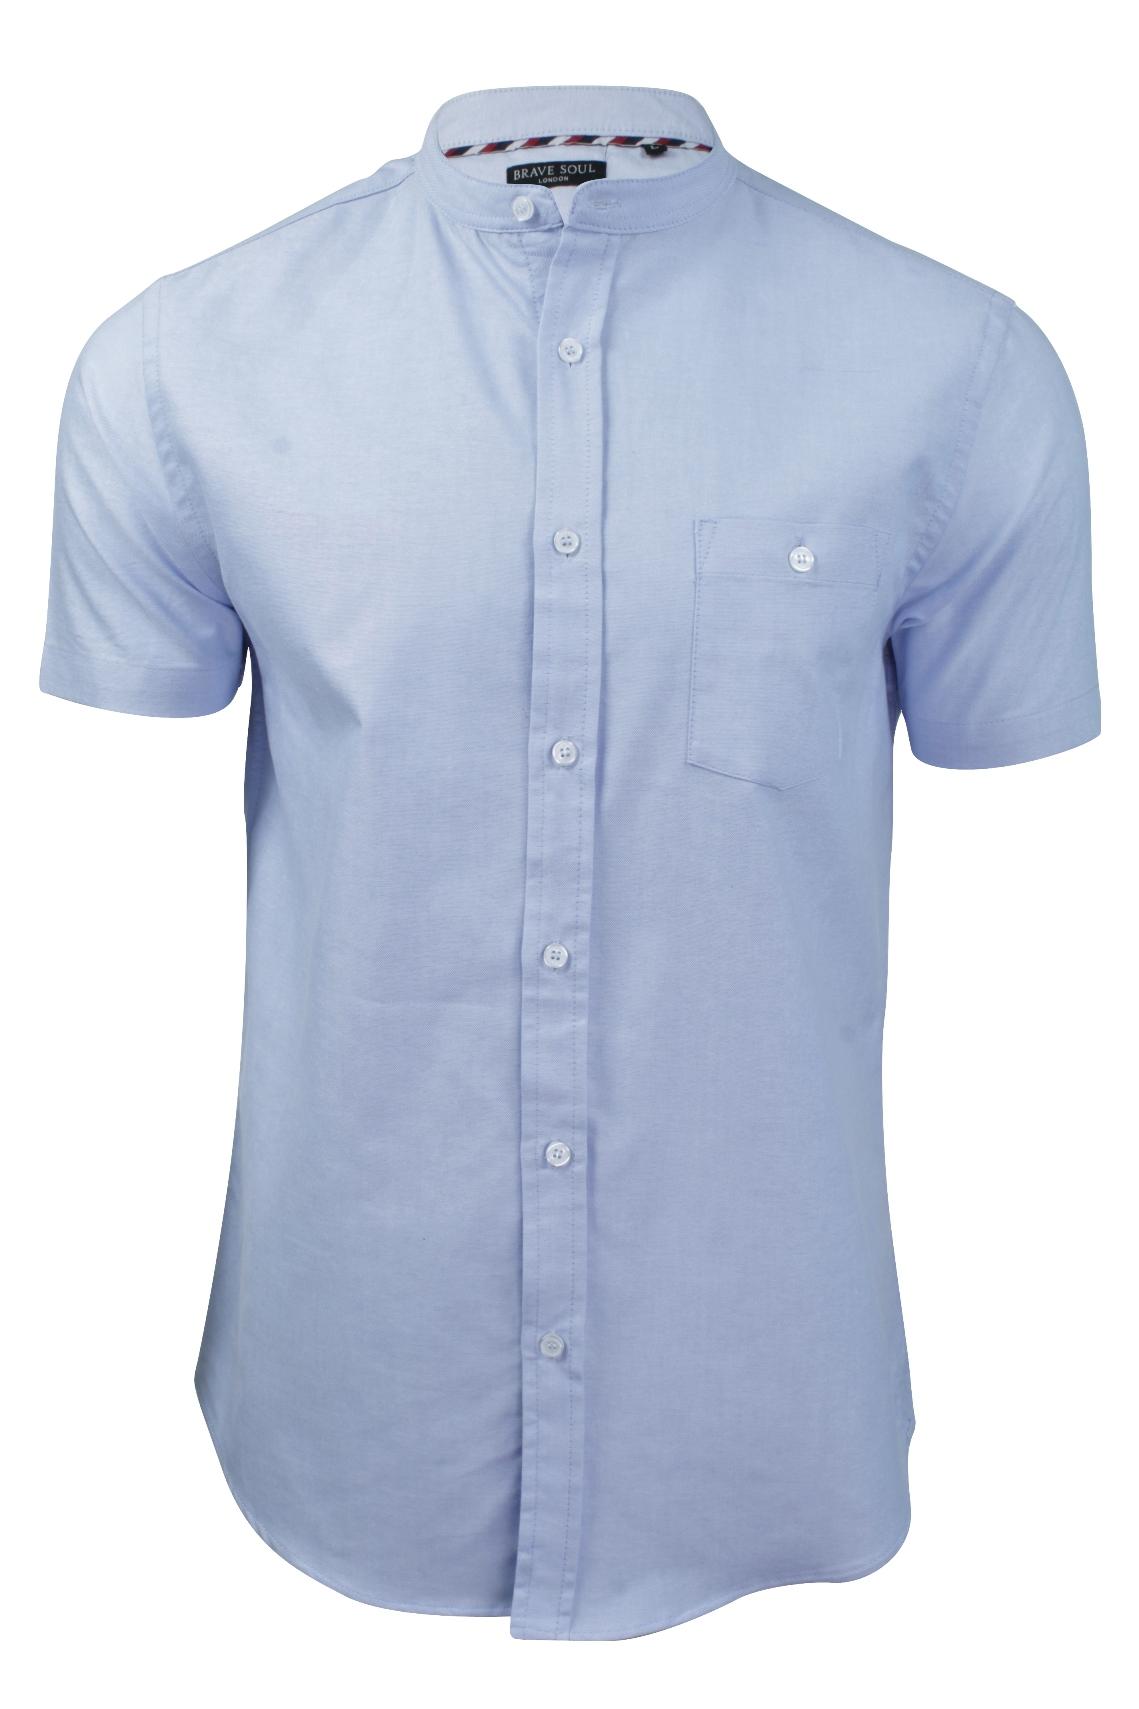 Mens grandad collar shirt by brave soul 39 tribune 39 slim fit for Men s dobby shirt